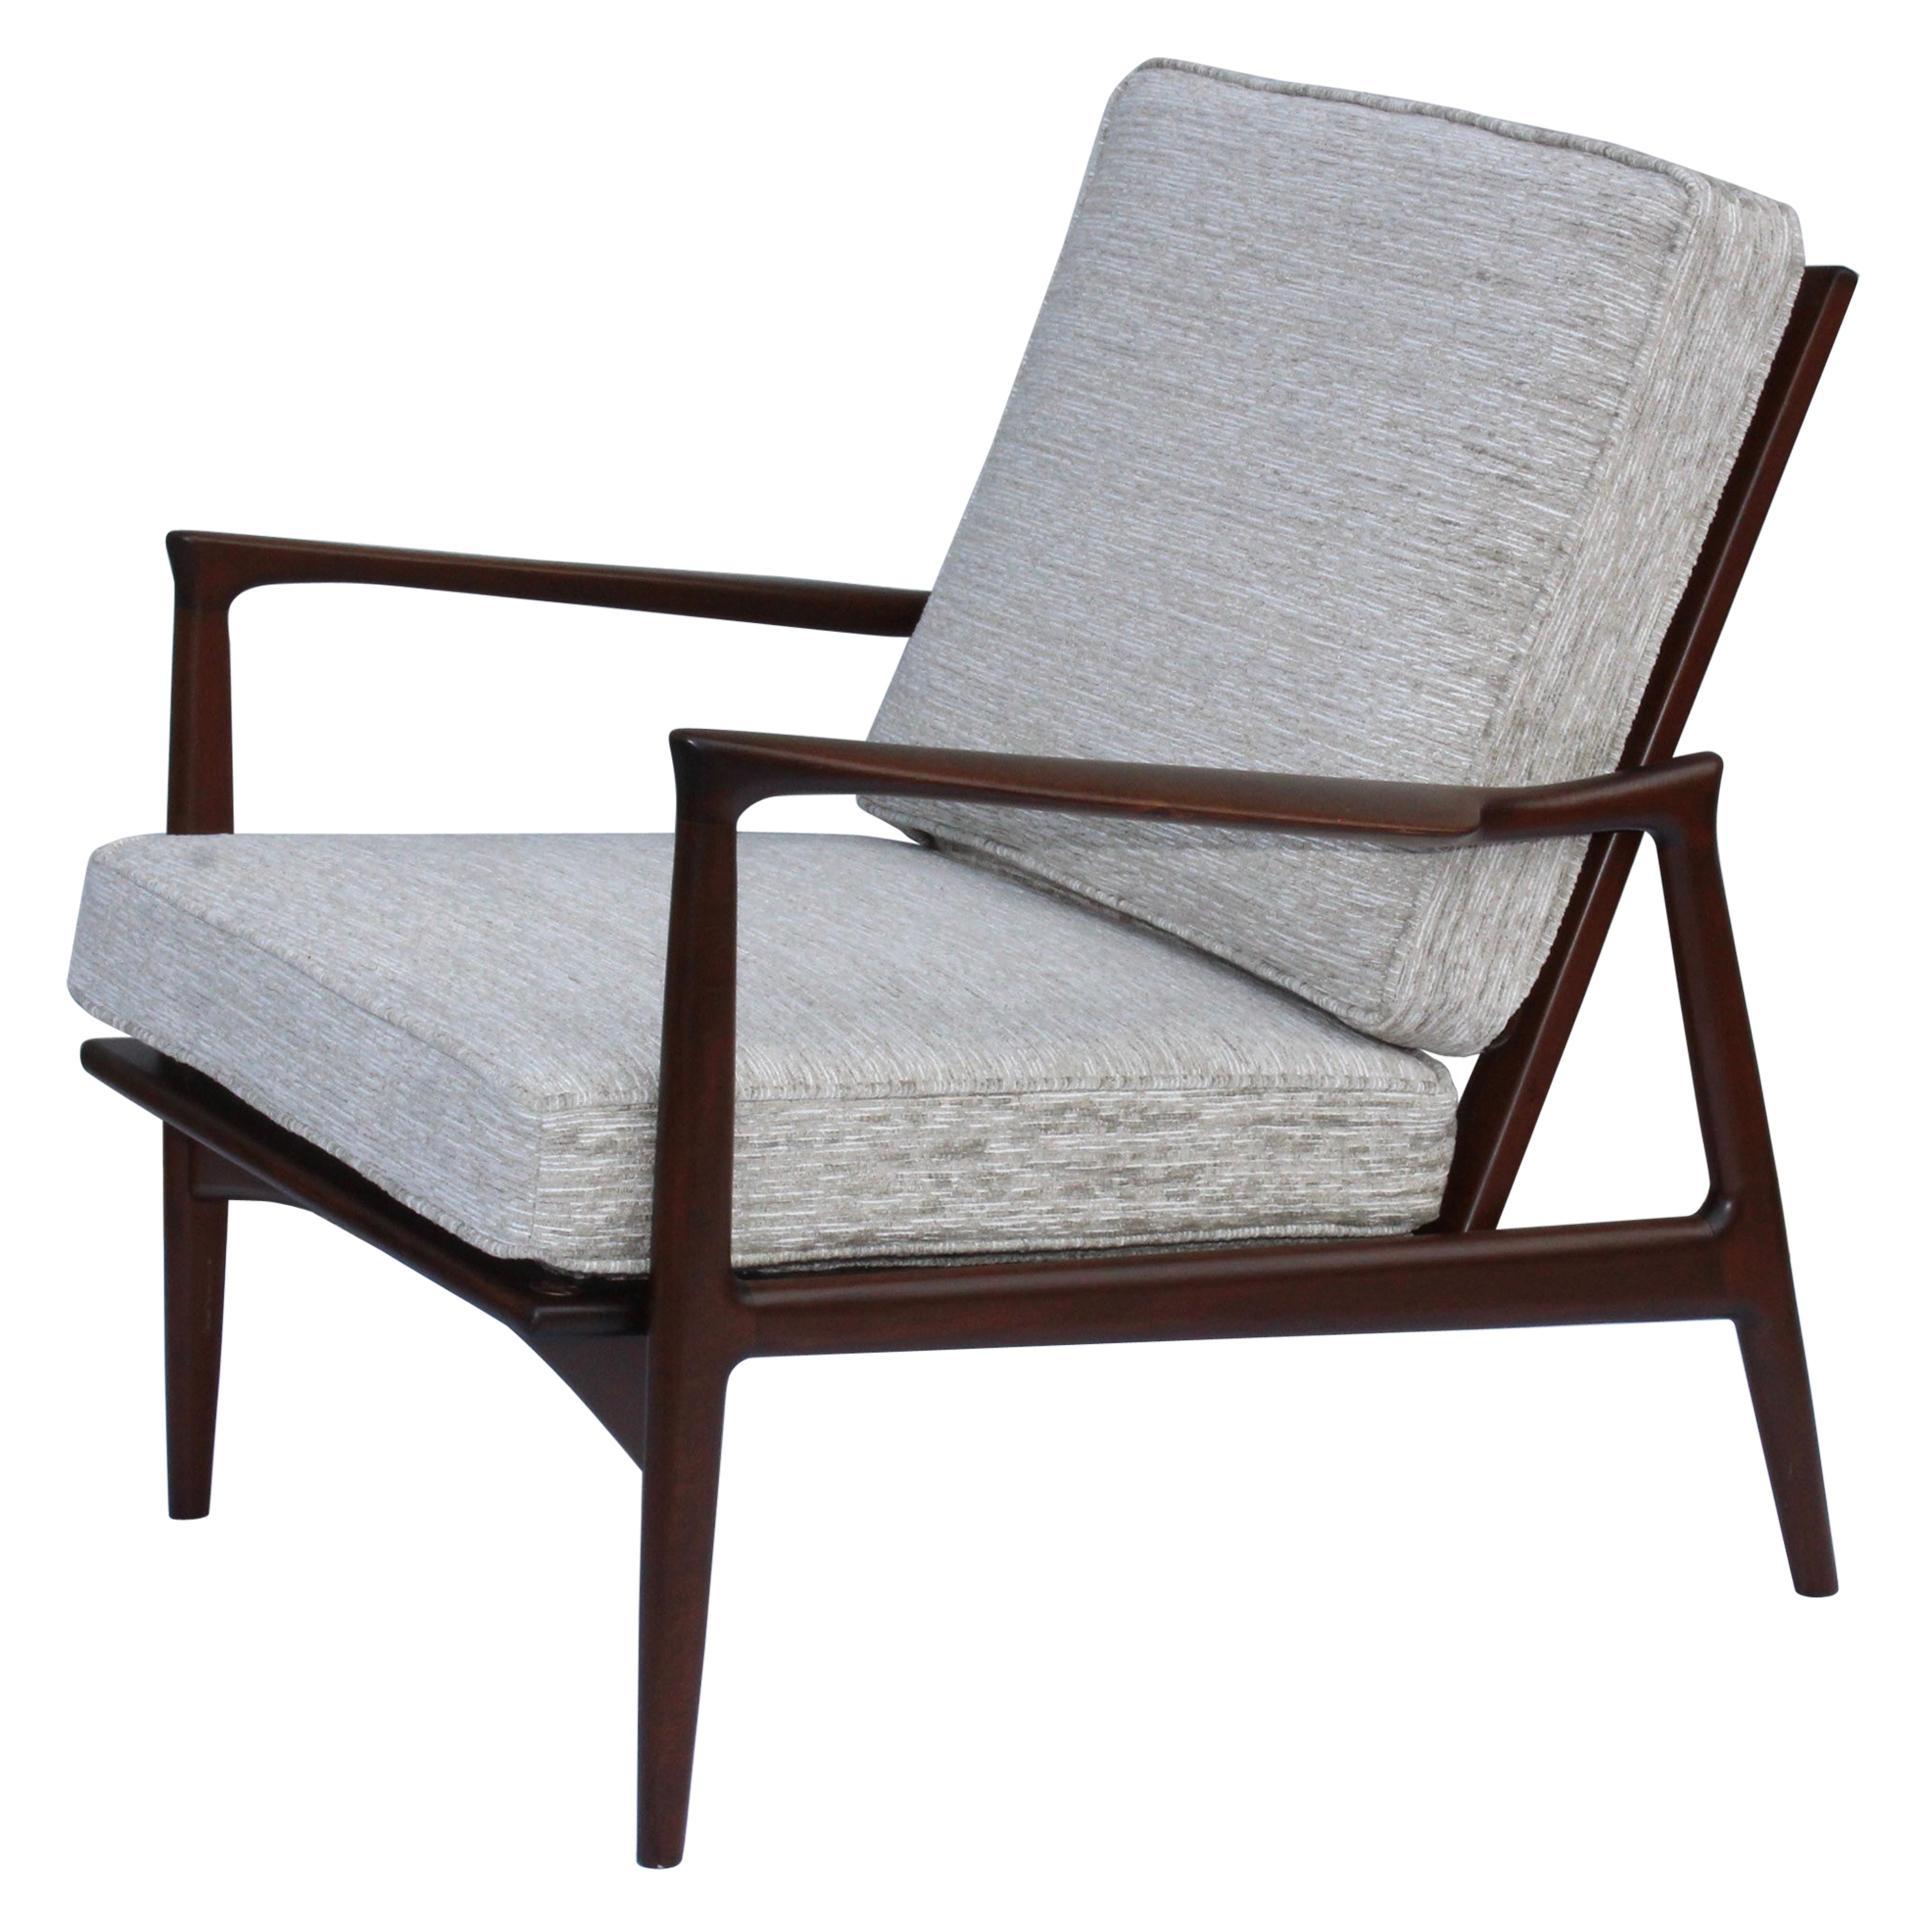 IB Kofod-Larsen Lounge Armchair